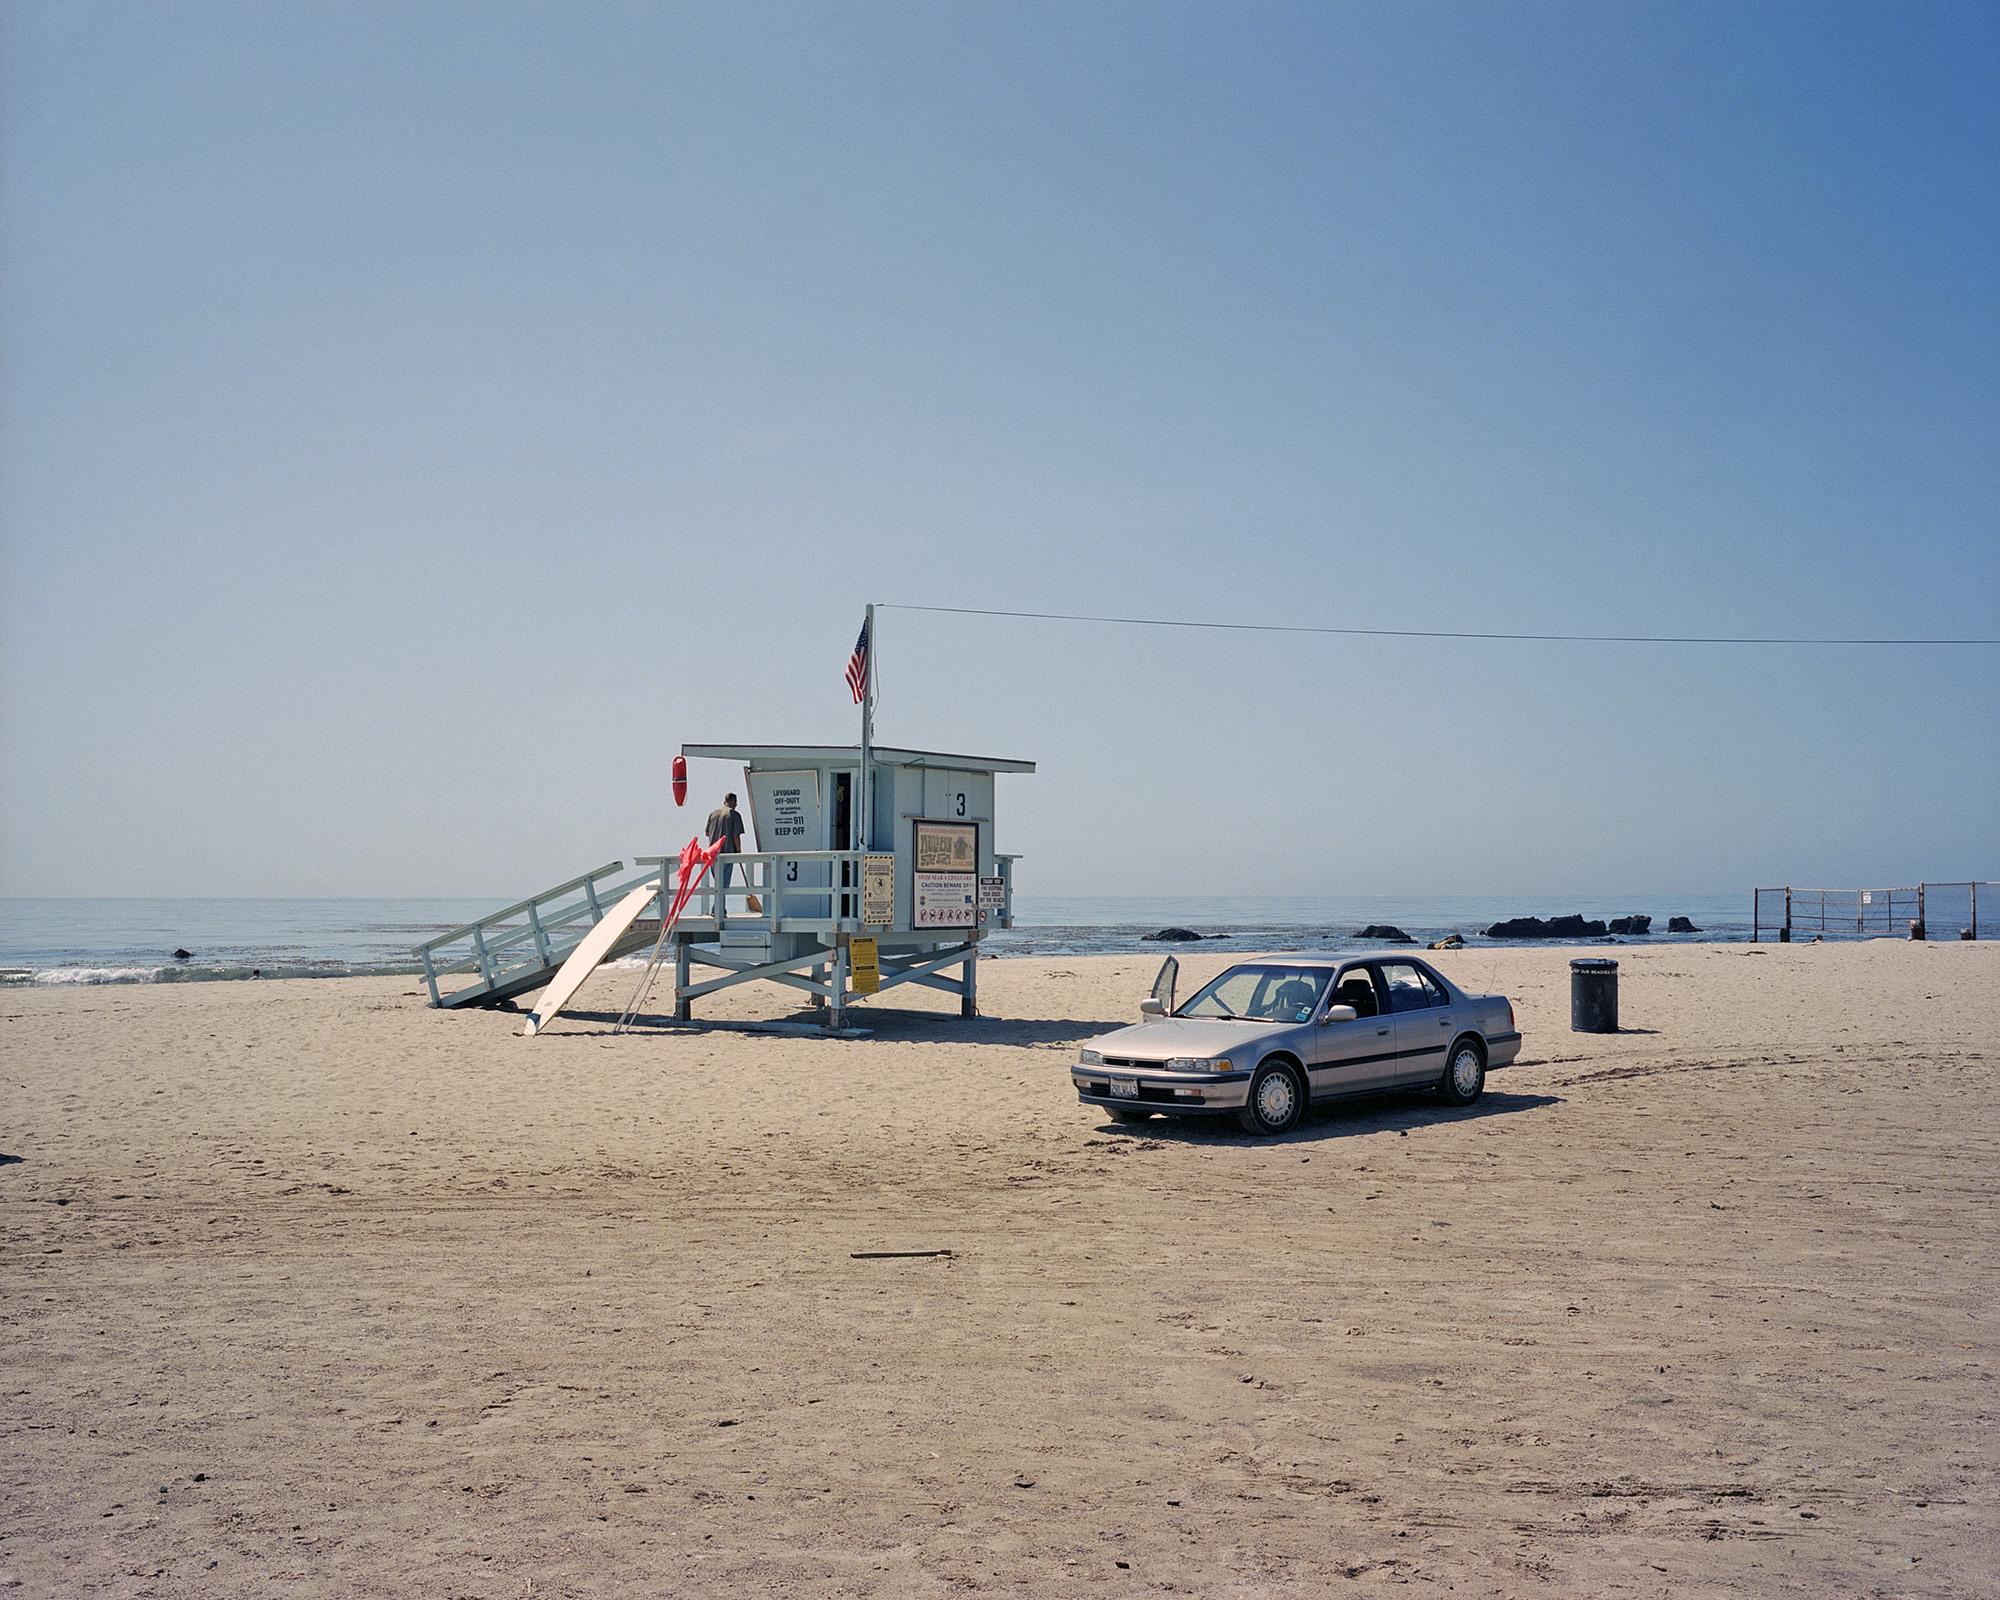 Malibu Lifeguard.jpg